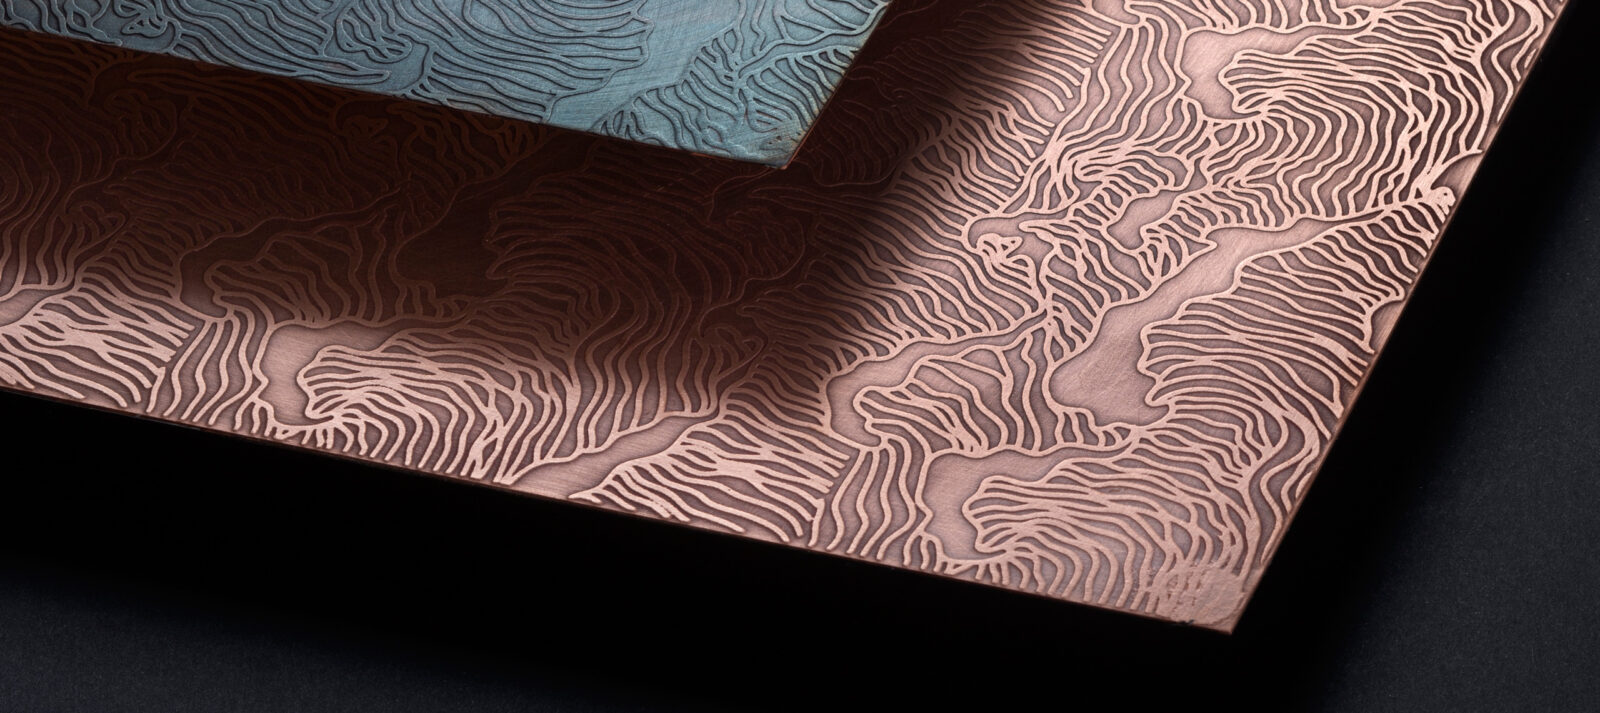 Copper: new project scenarios